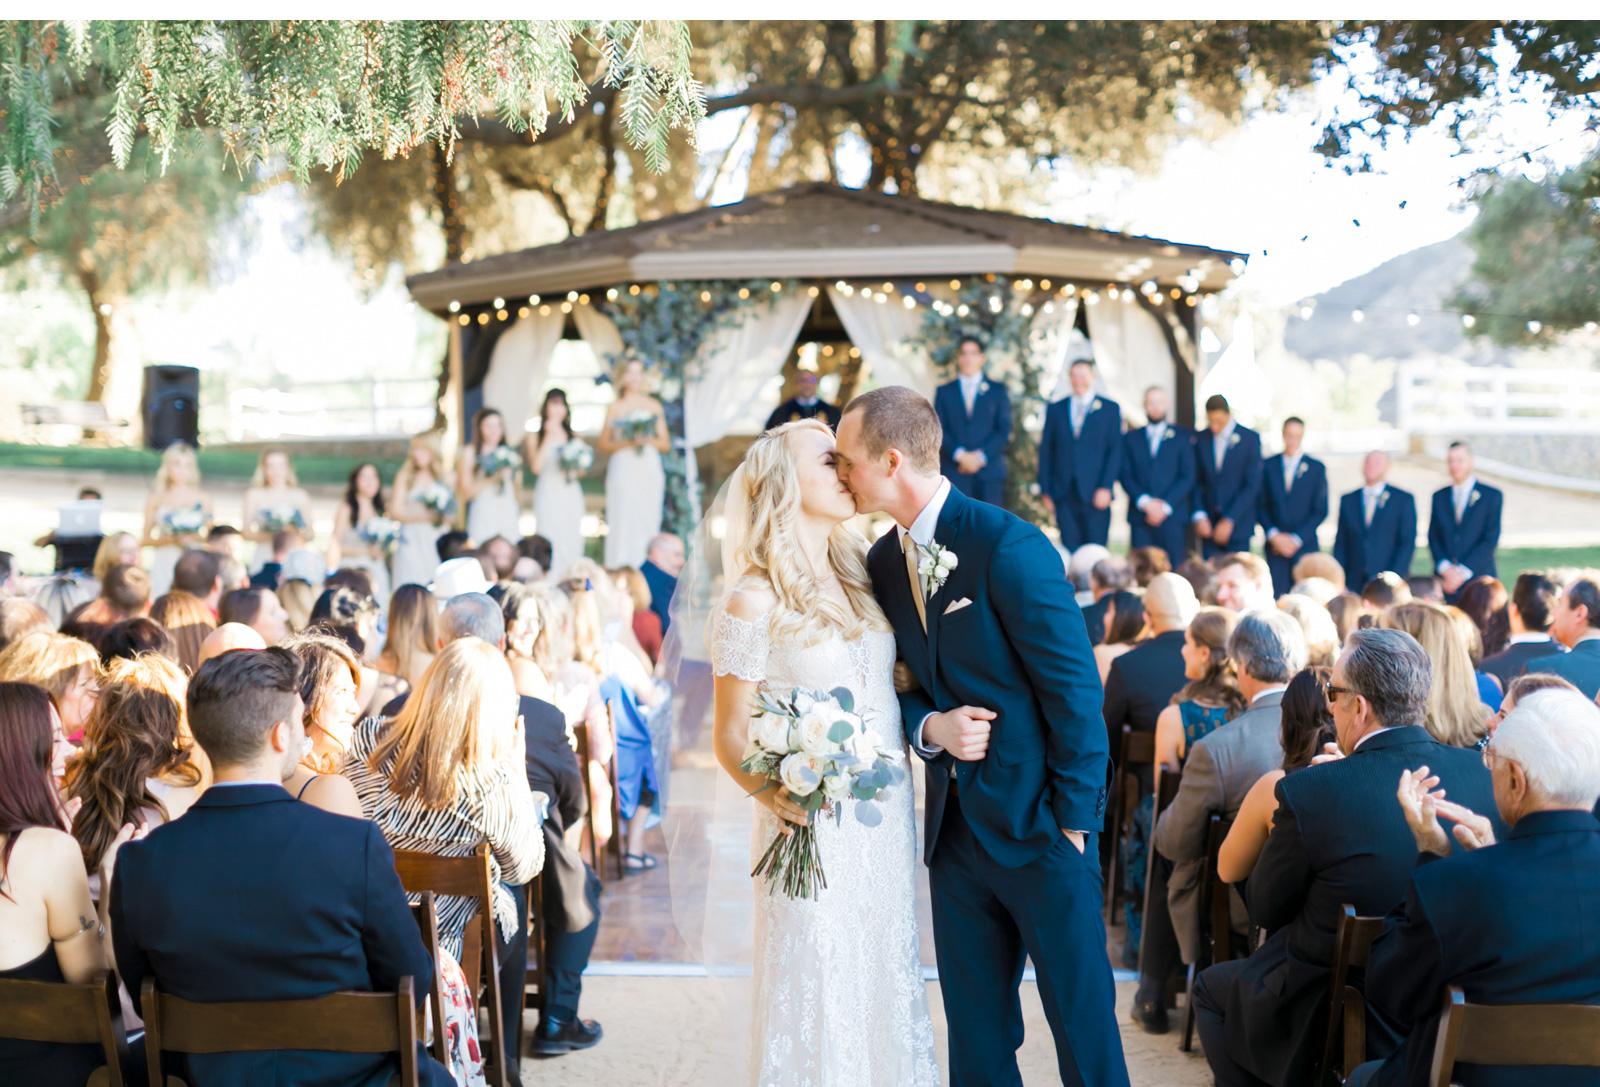 Style-Me-Pretty-Wedding-Photographer-Natalie-Schutt-Photography-Calfornia-San-Luis-Obispo_08.jpg